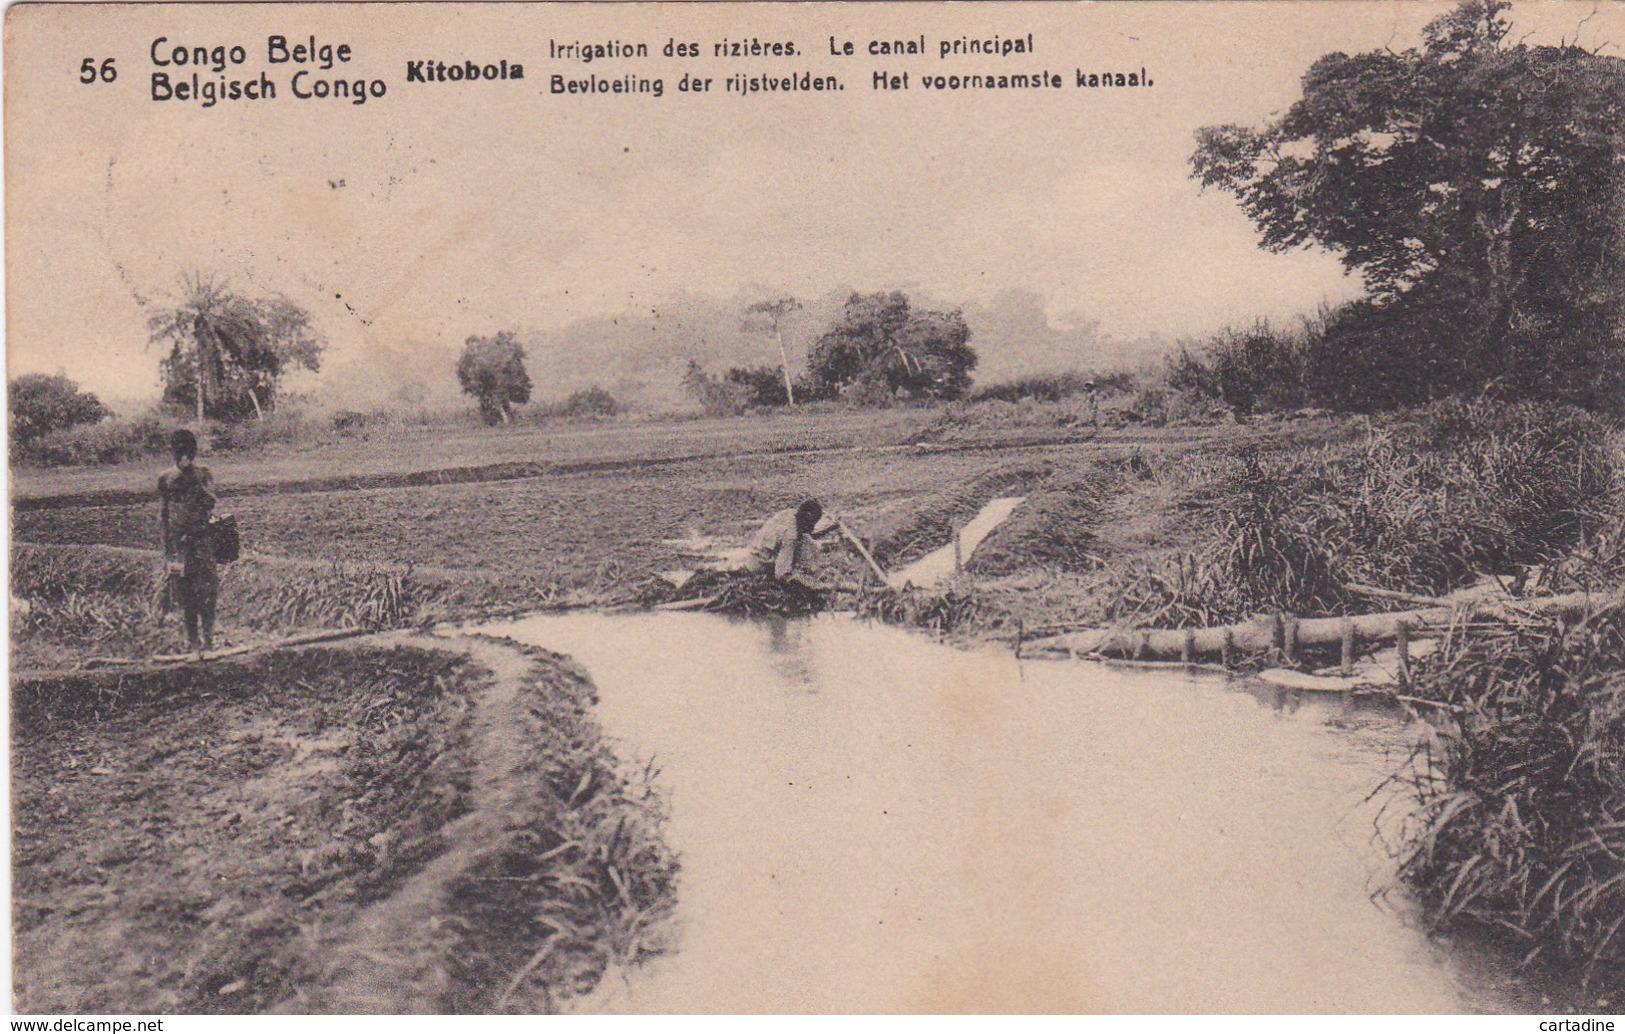 Entier Postal  Congo Belge/ Belgisch Congo - Kitobola - Irrigation Des Rizières - Le Canal Principal -  N° 56 - 1917 - Entiers Postaux